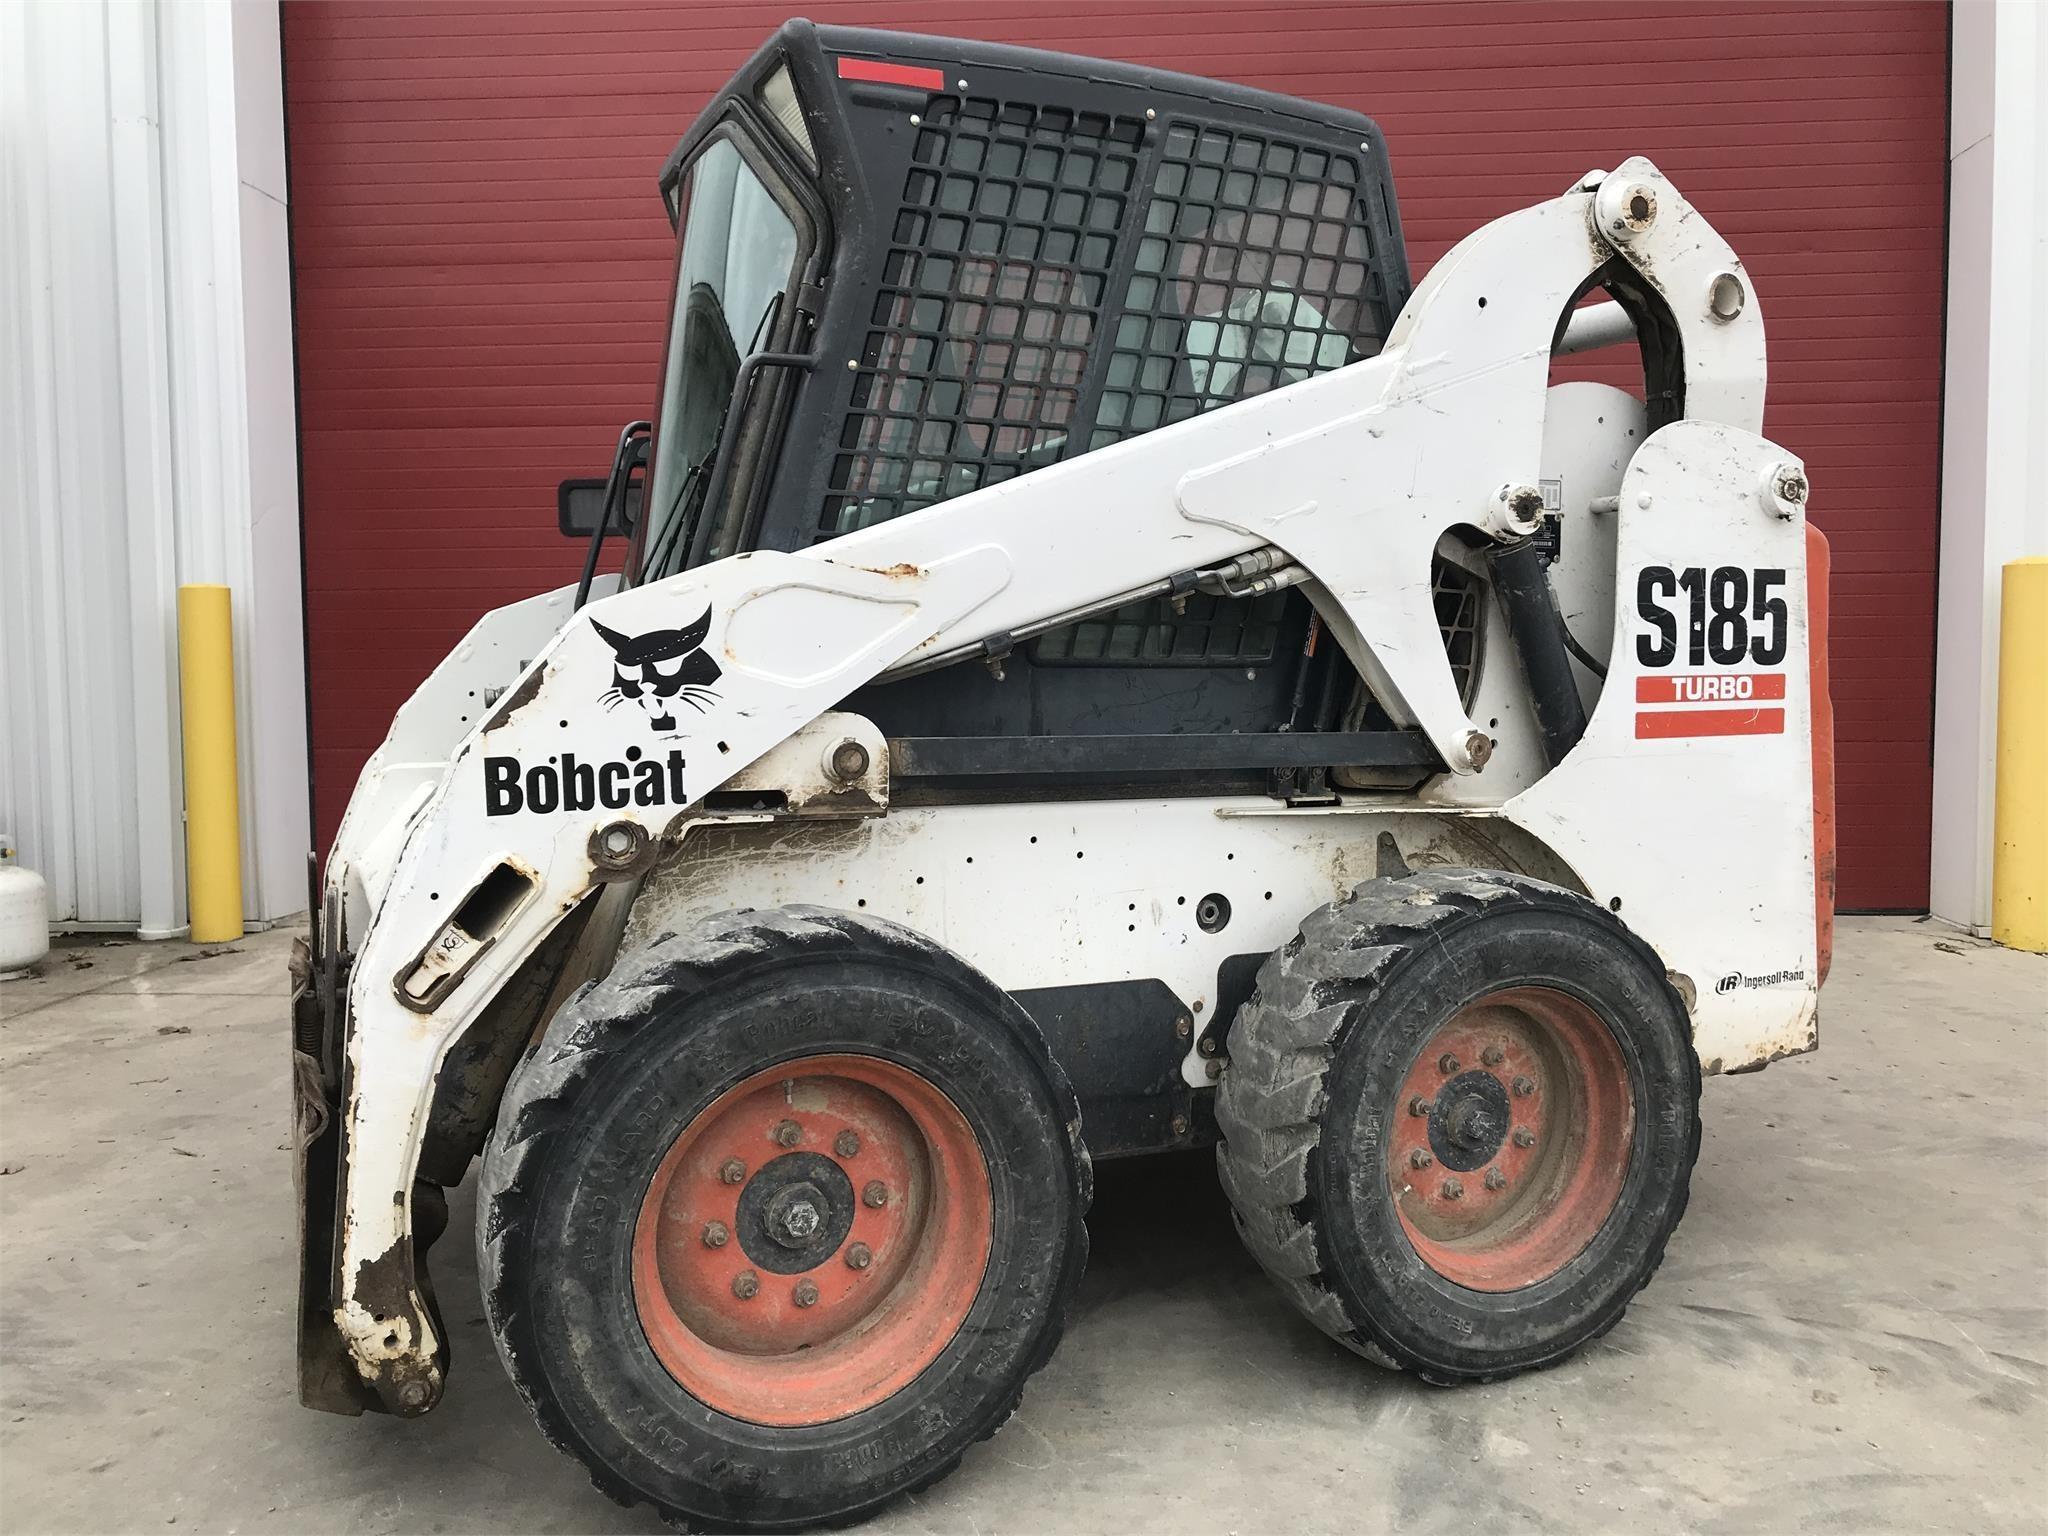 2006 Bobcat S185 Skid Steer